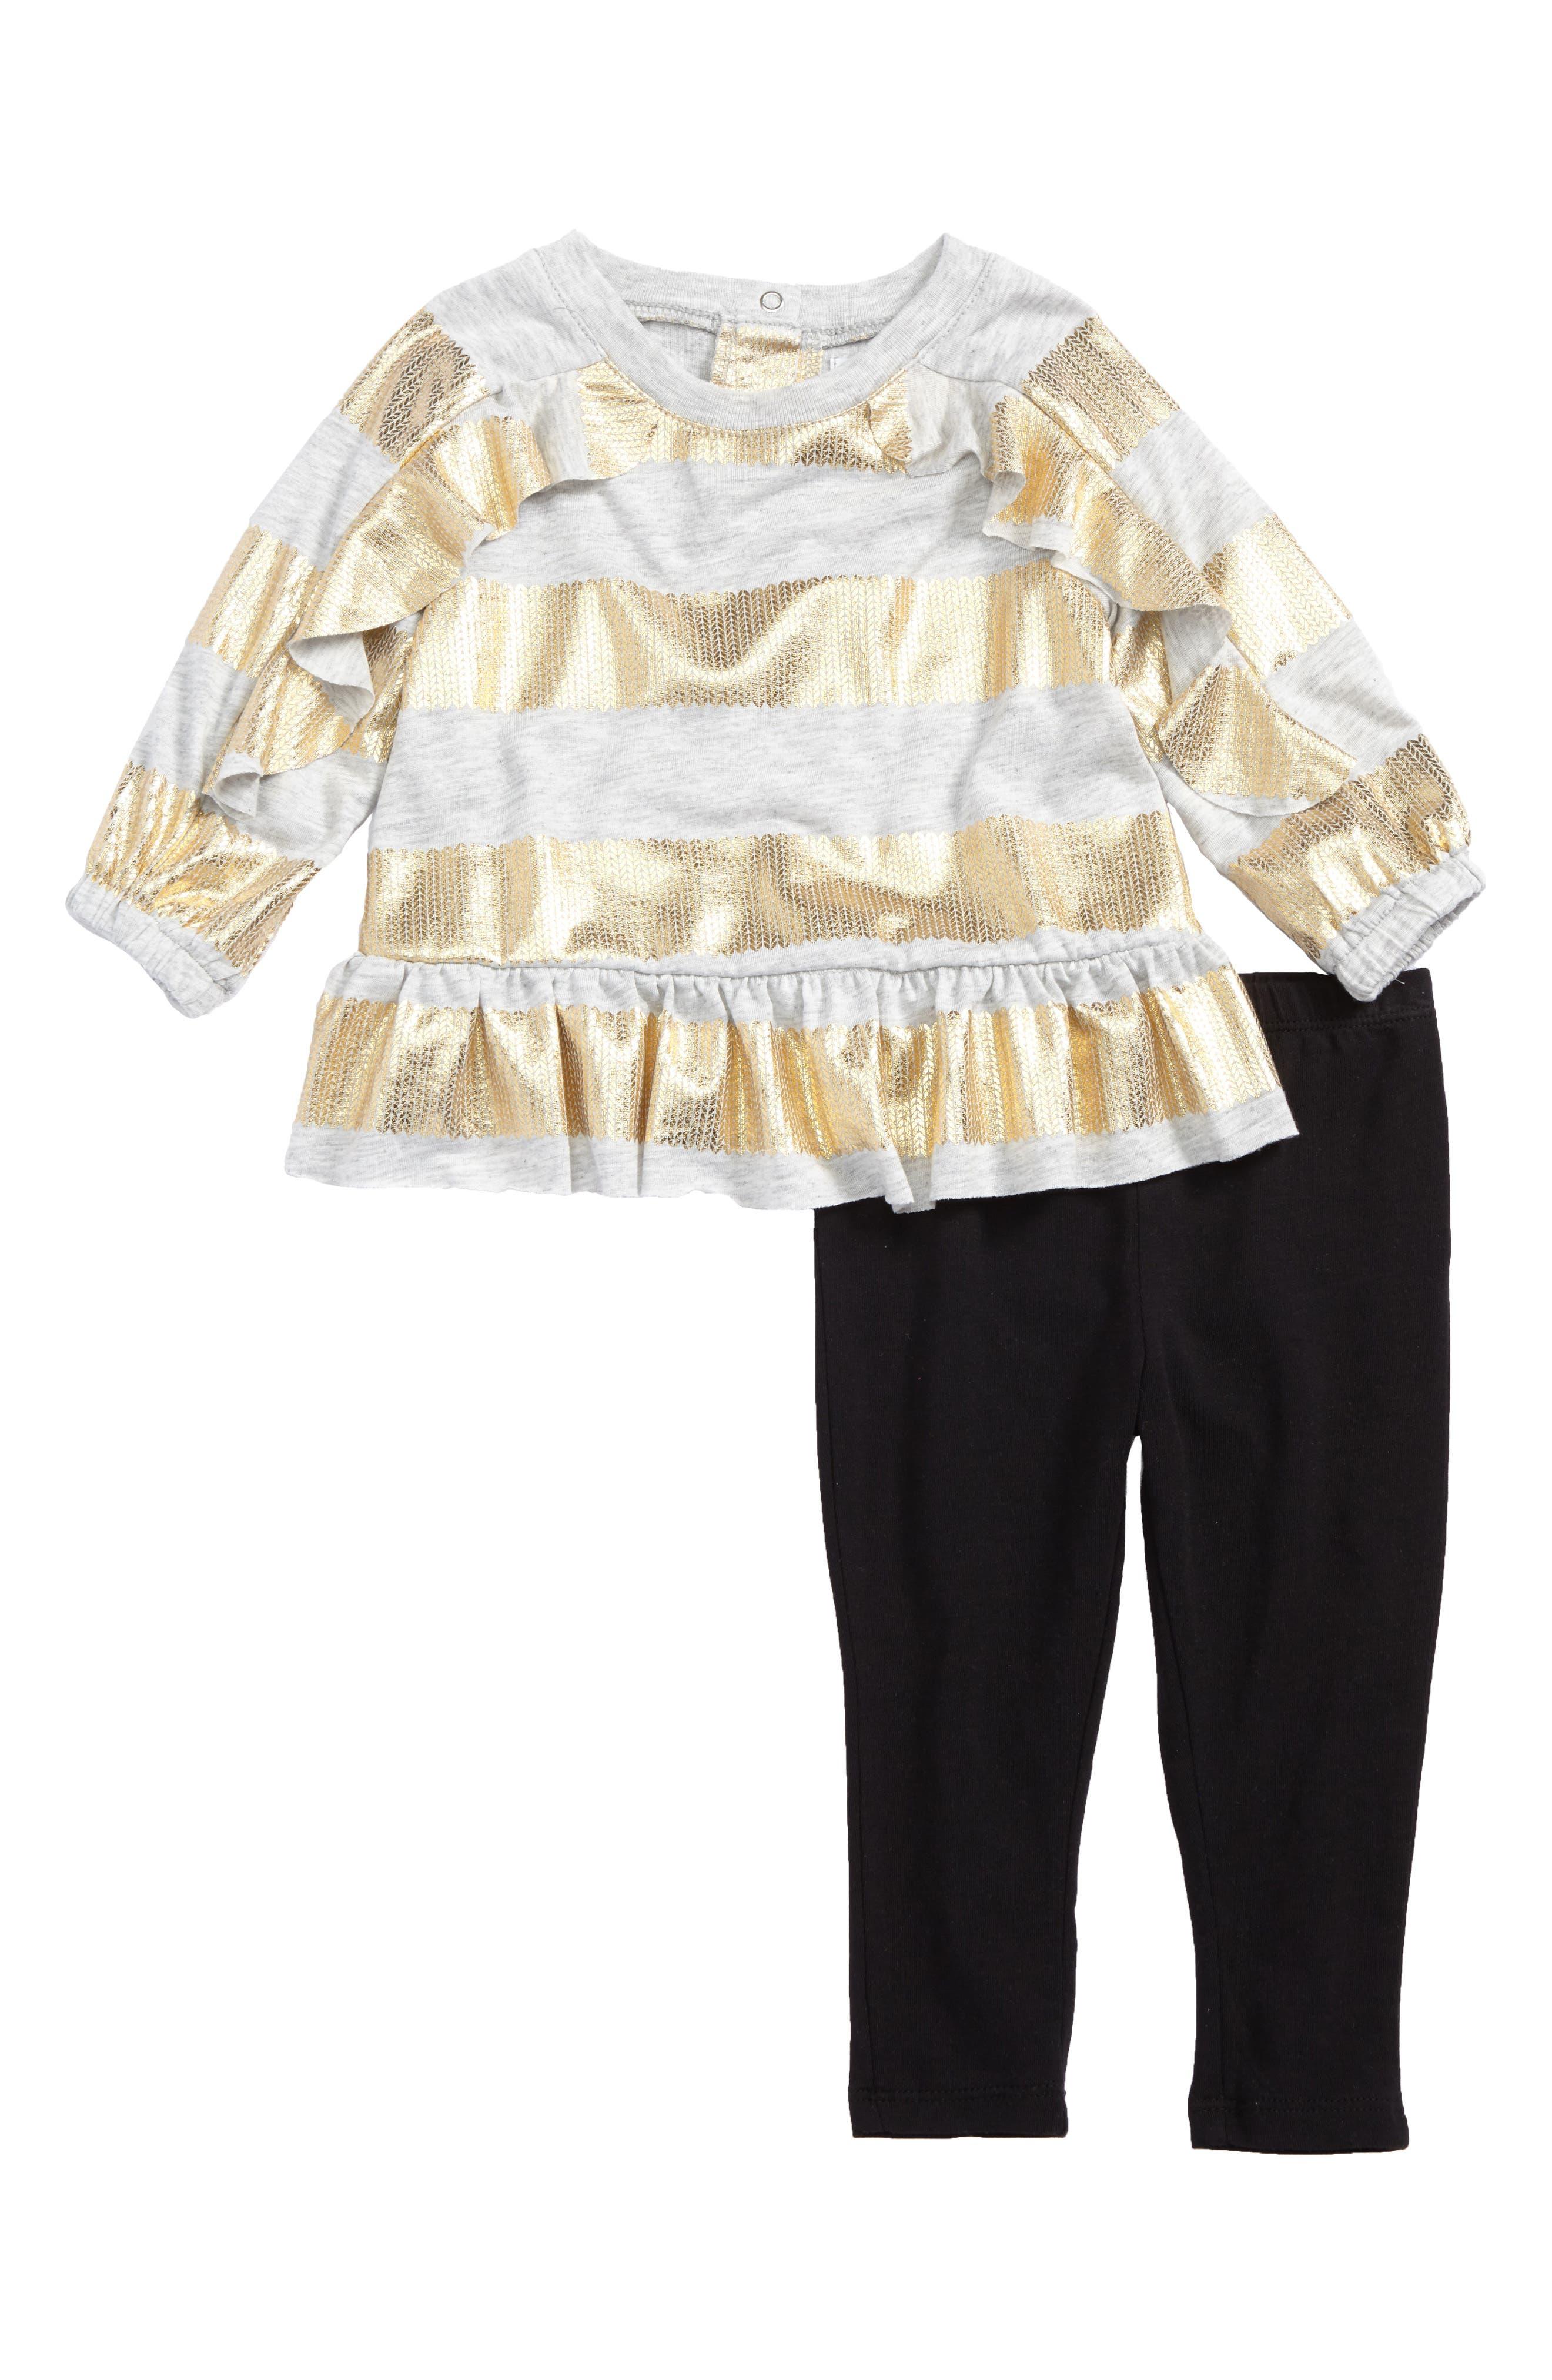 Shimmer Stripe Ruffle Top & Leggings Set,                             Main thumbnail 1, color,                             020